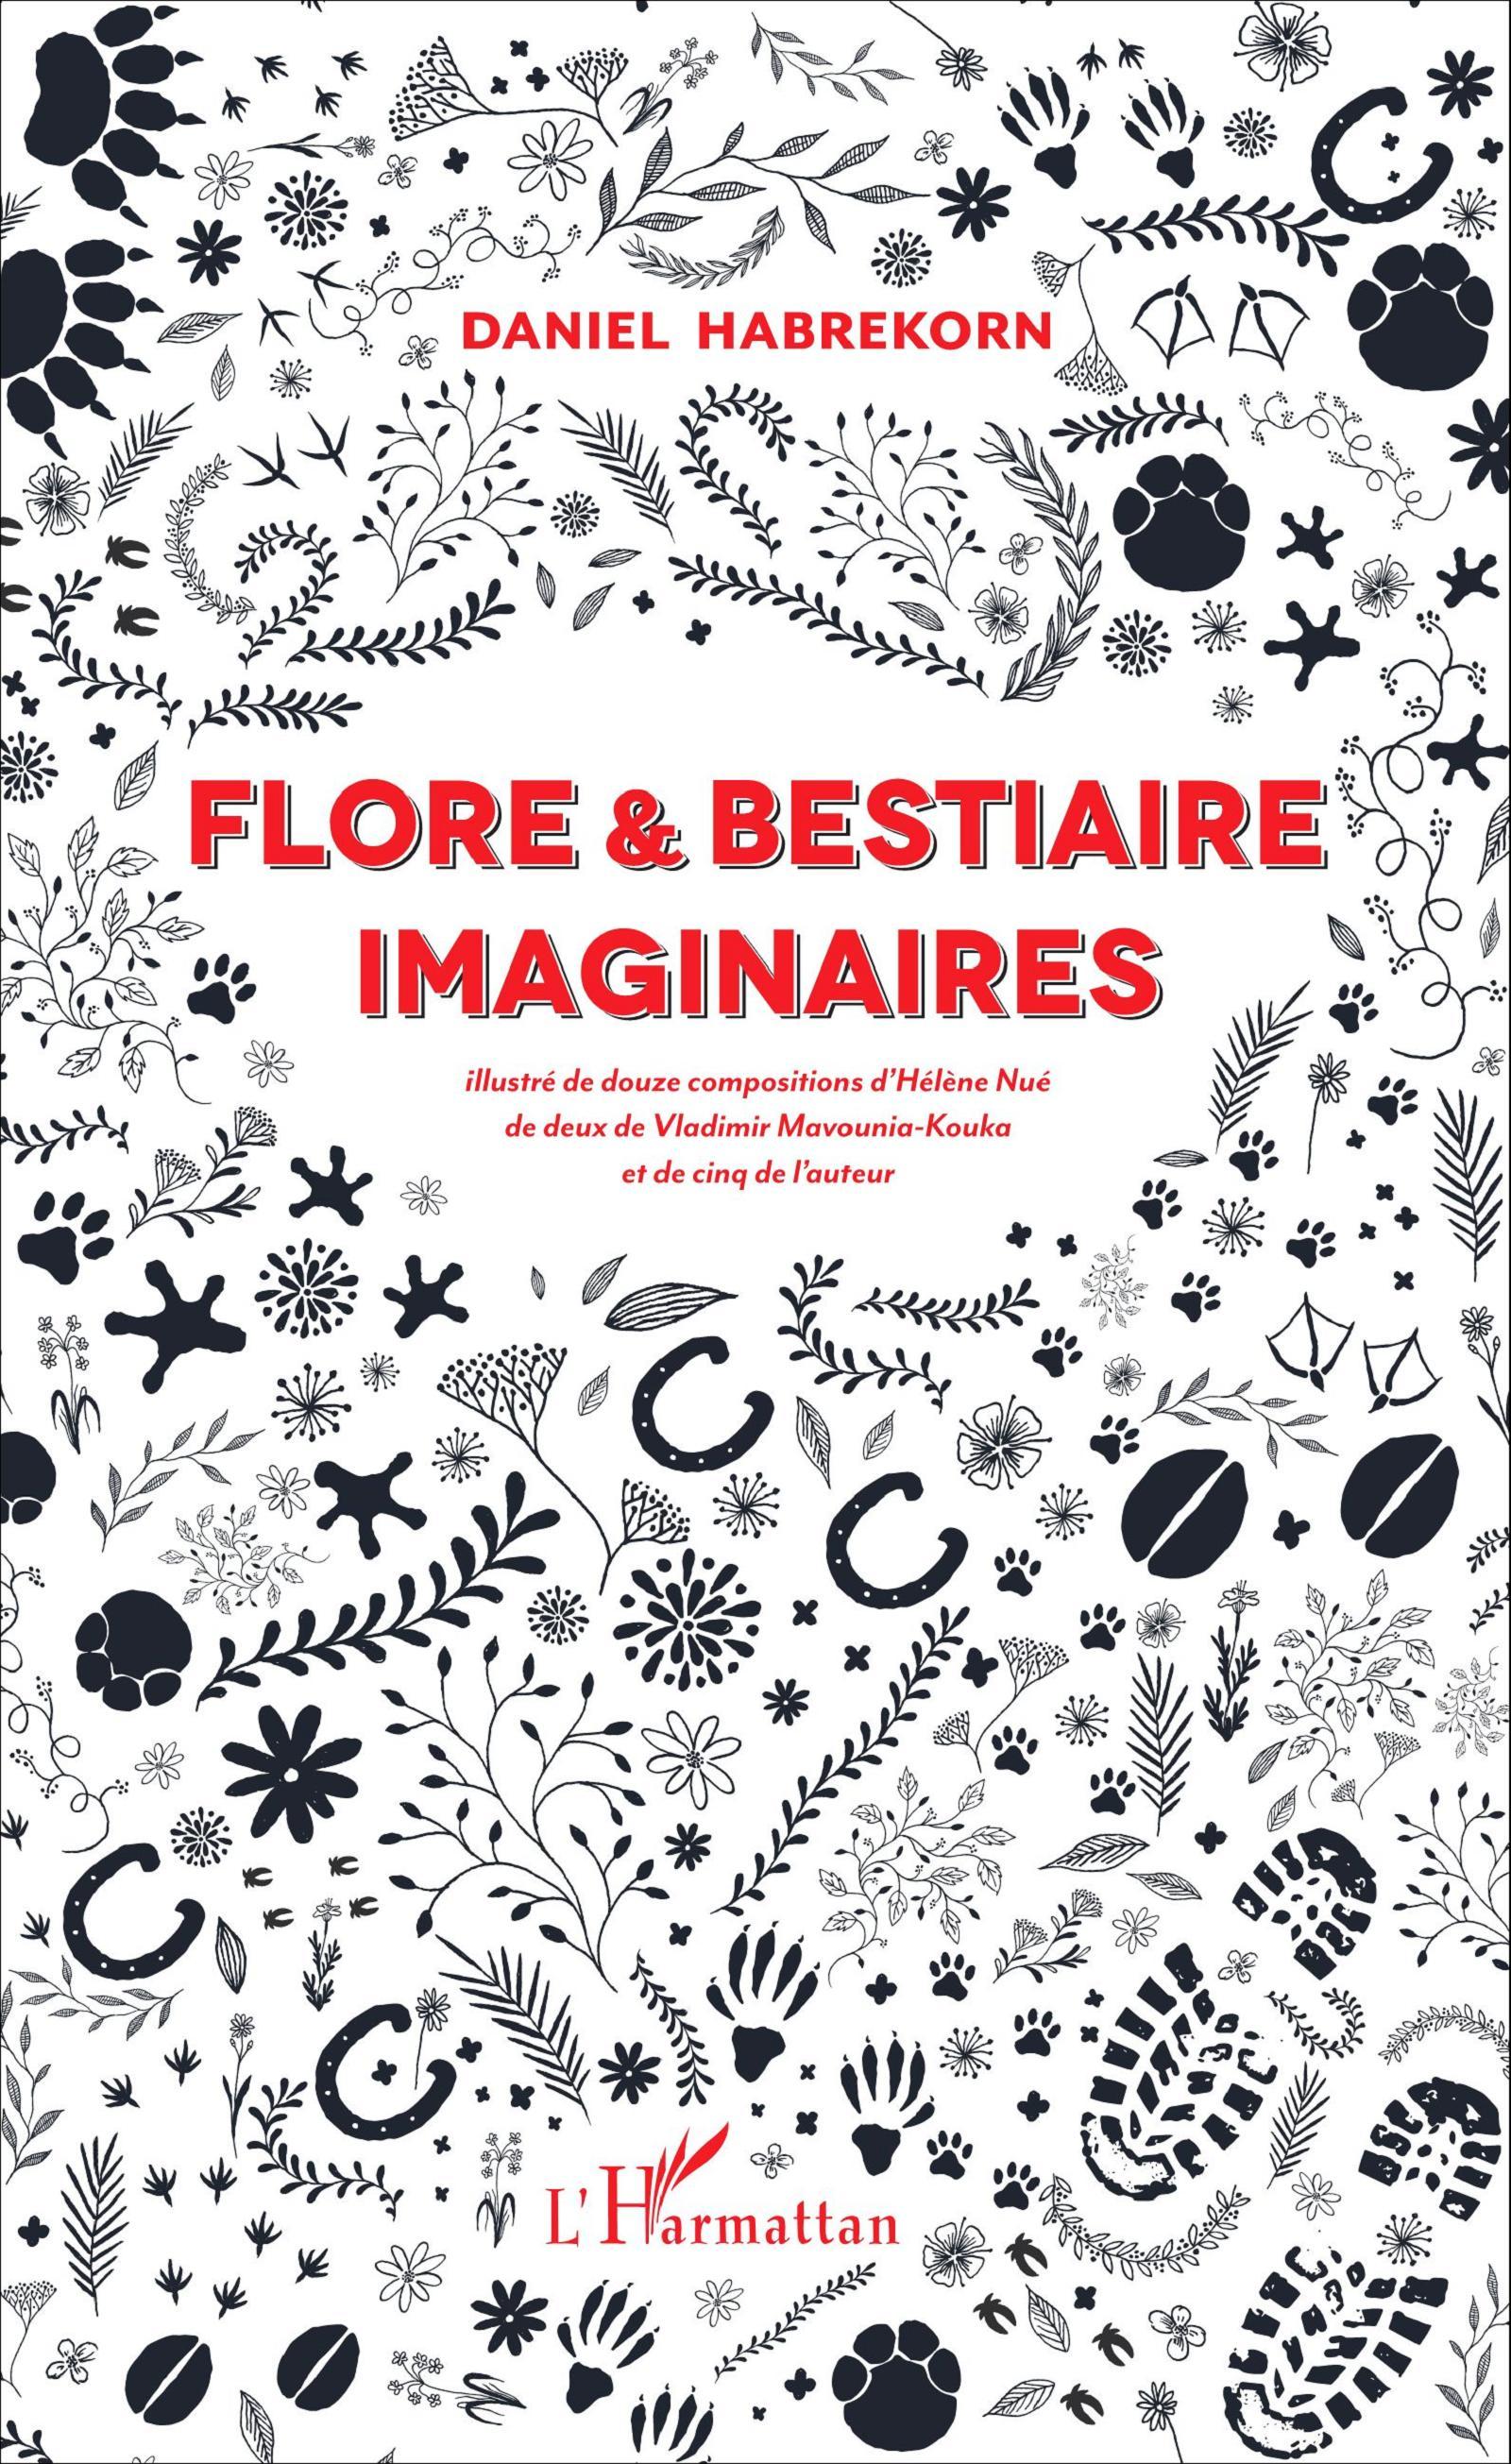 Flore et bestiaire imaginaires